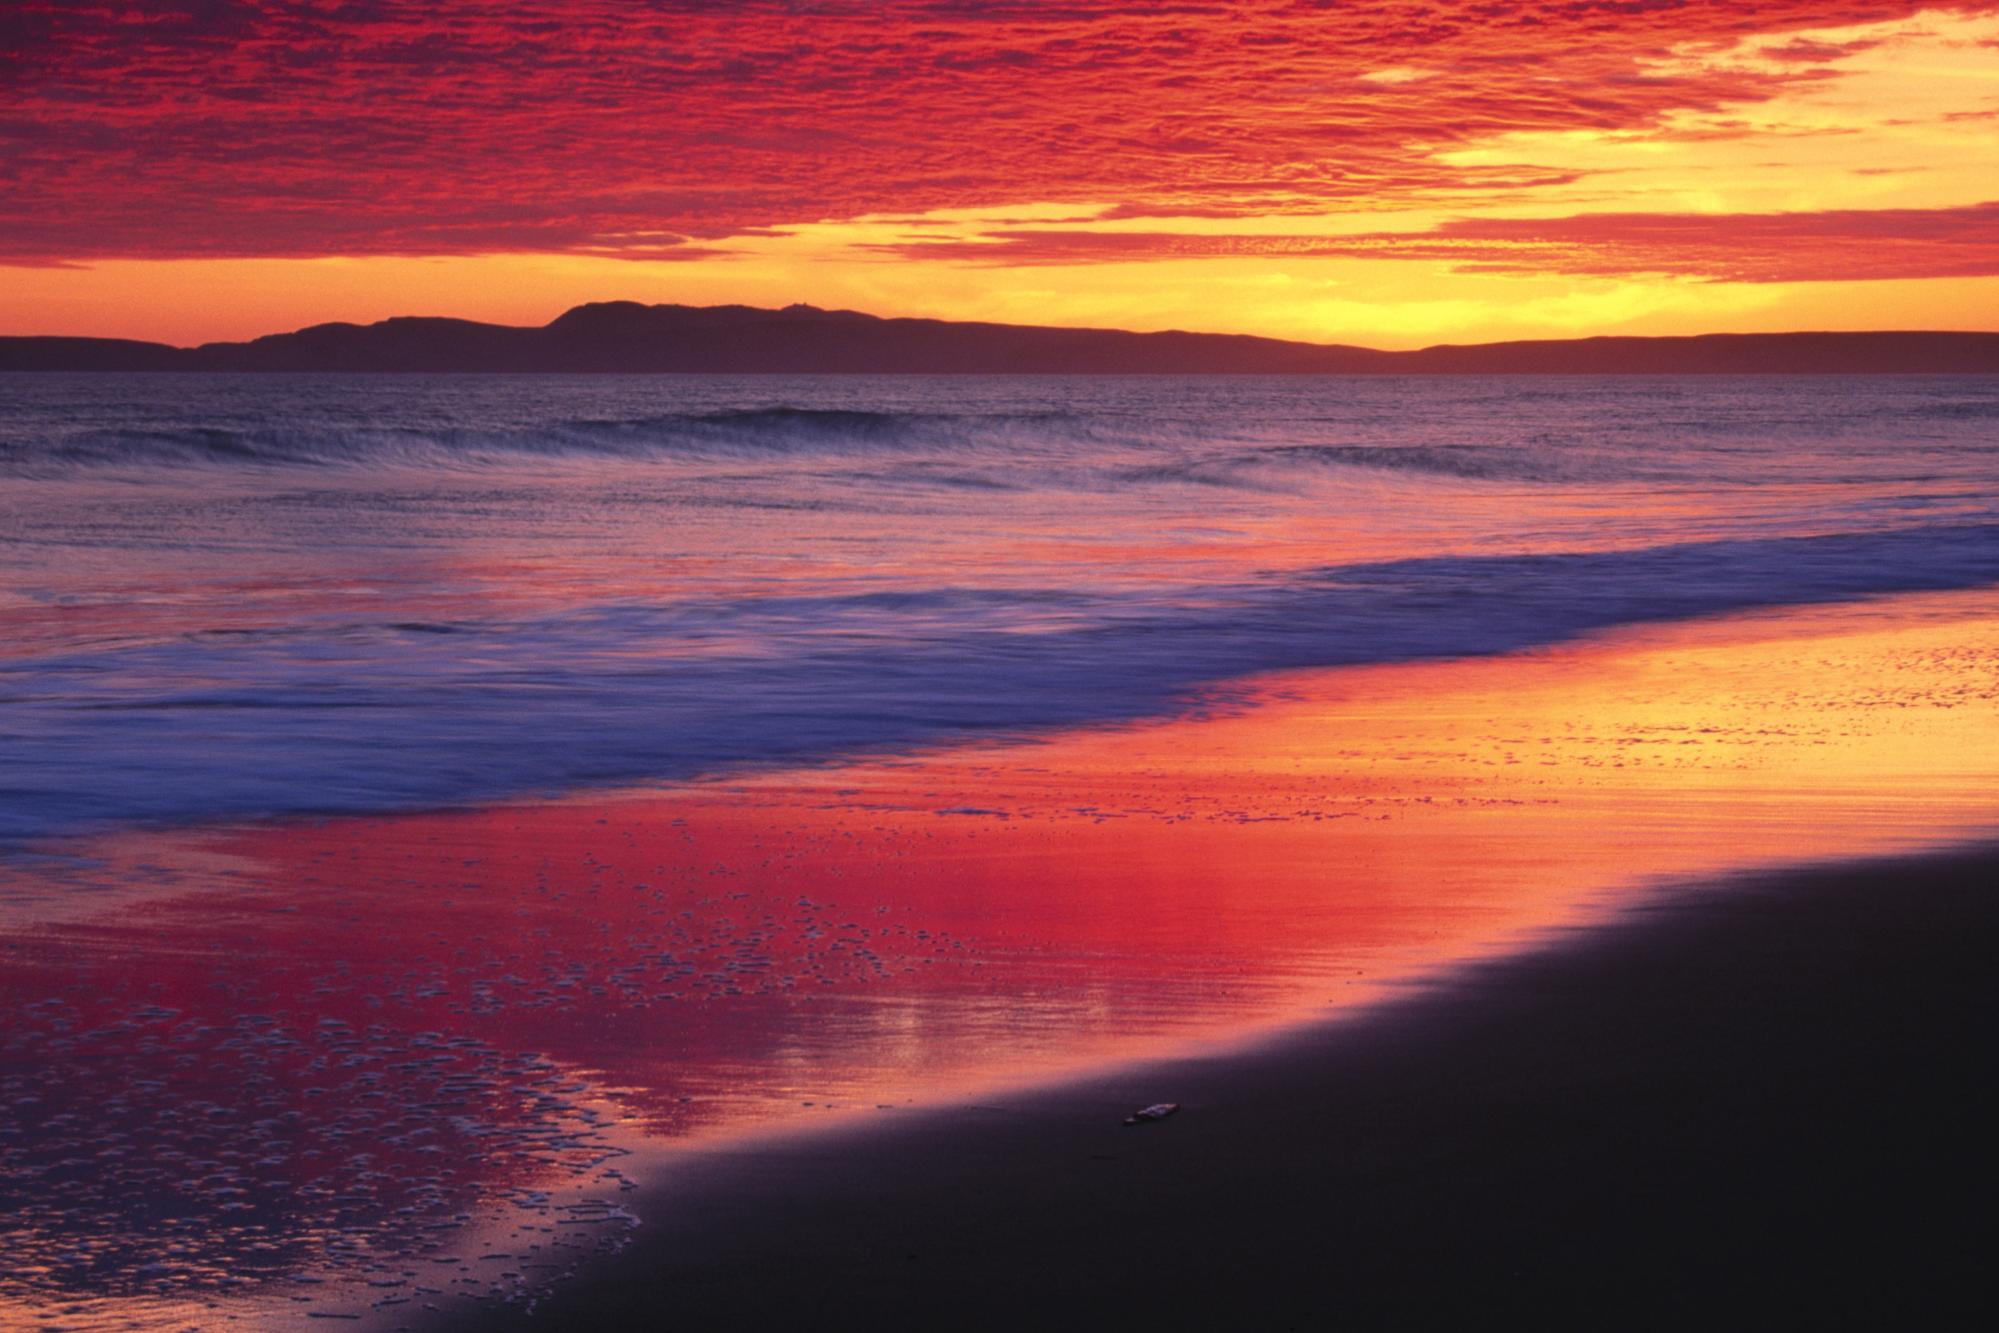 Sunset Wallpapers SunsetBeautiful Sunset Pc Wallpapers 1999x1333